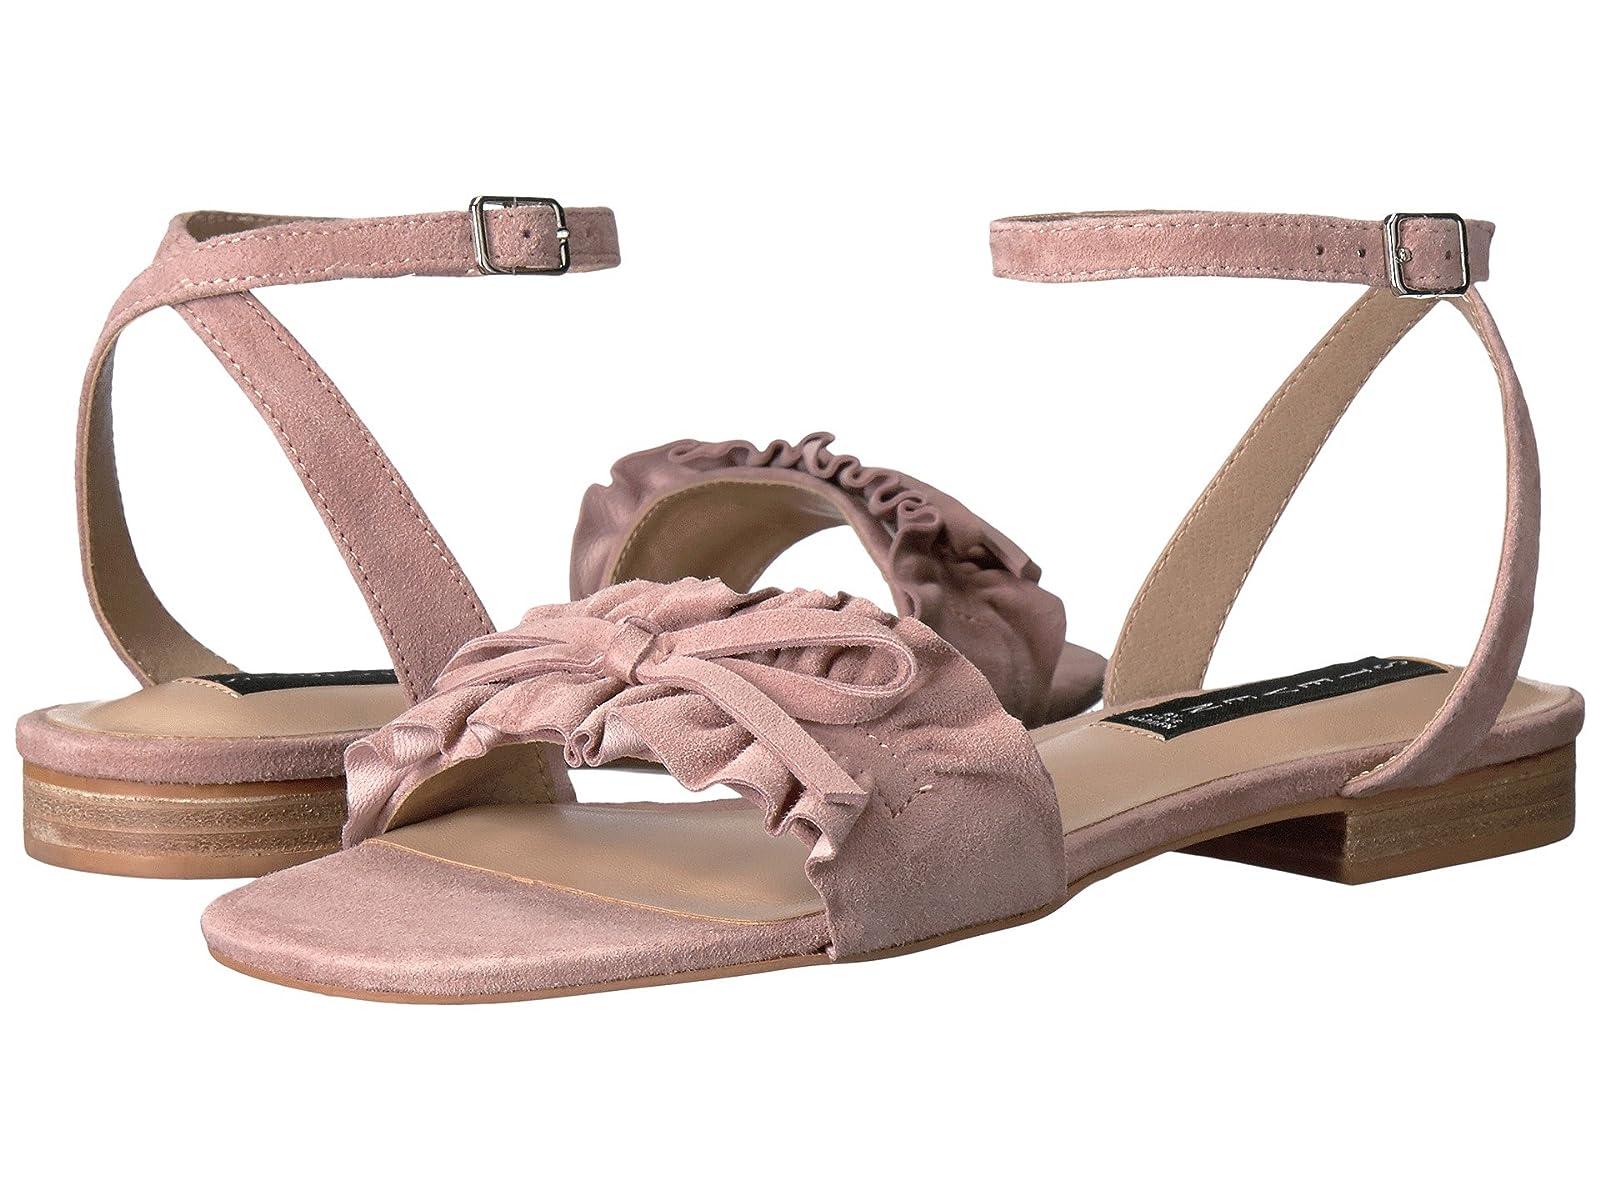 Steven CassielCheap and distinctive eye-catching shoes